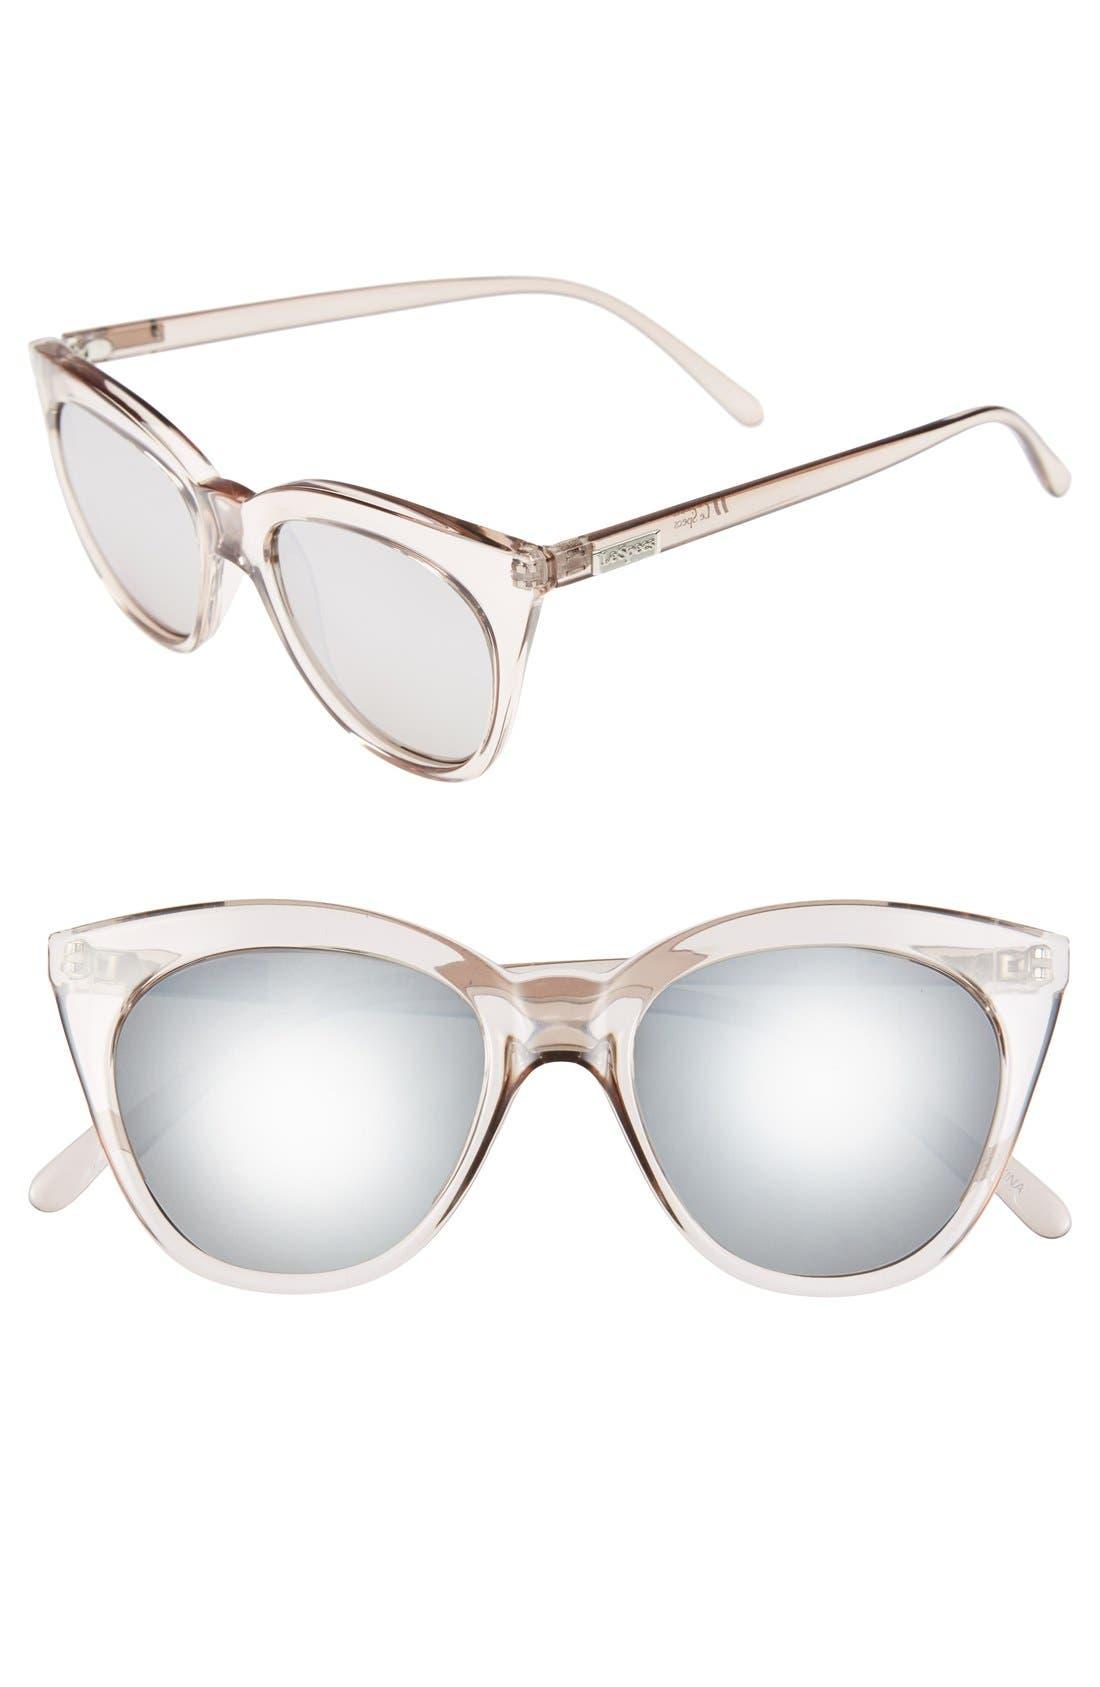 Halfmoon Magic 51mm Cat Eye Sunglasses,                         Main,                         color, Stone/ Silver Mirror